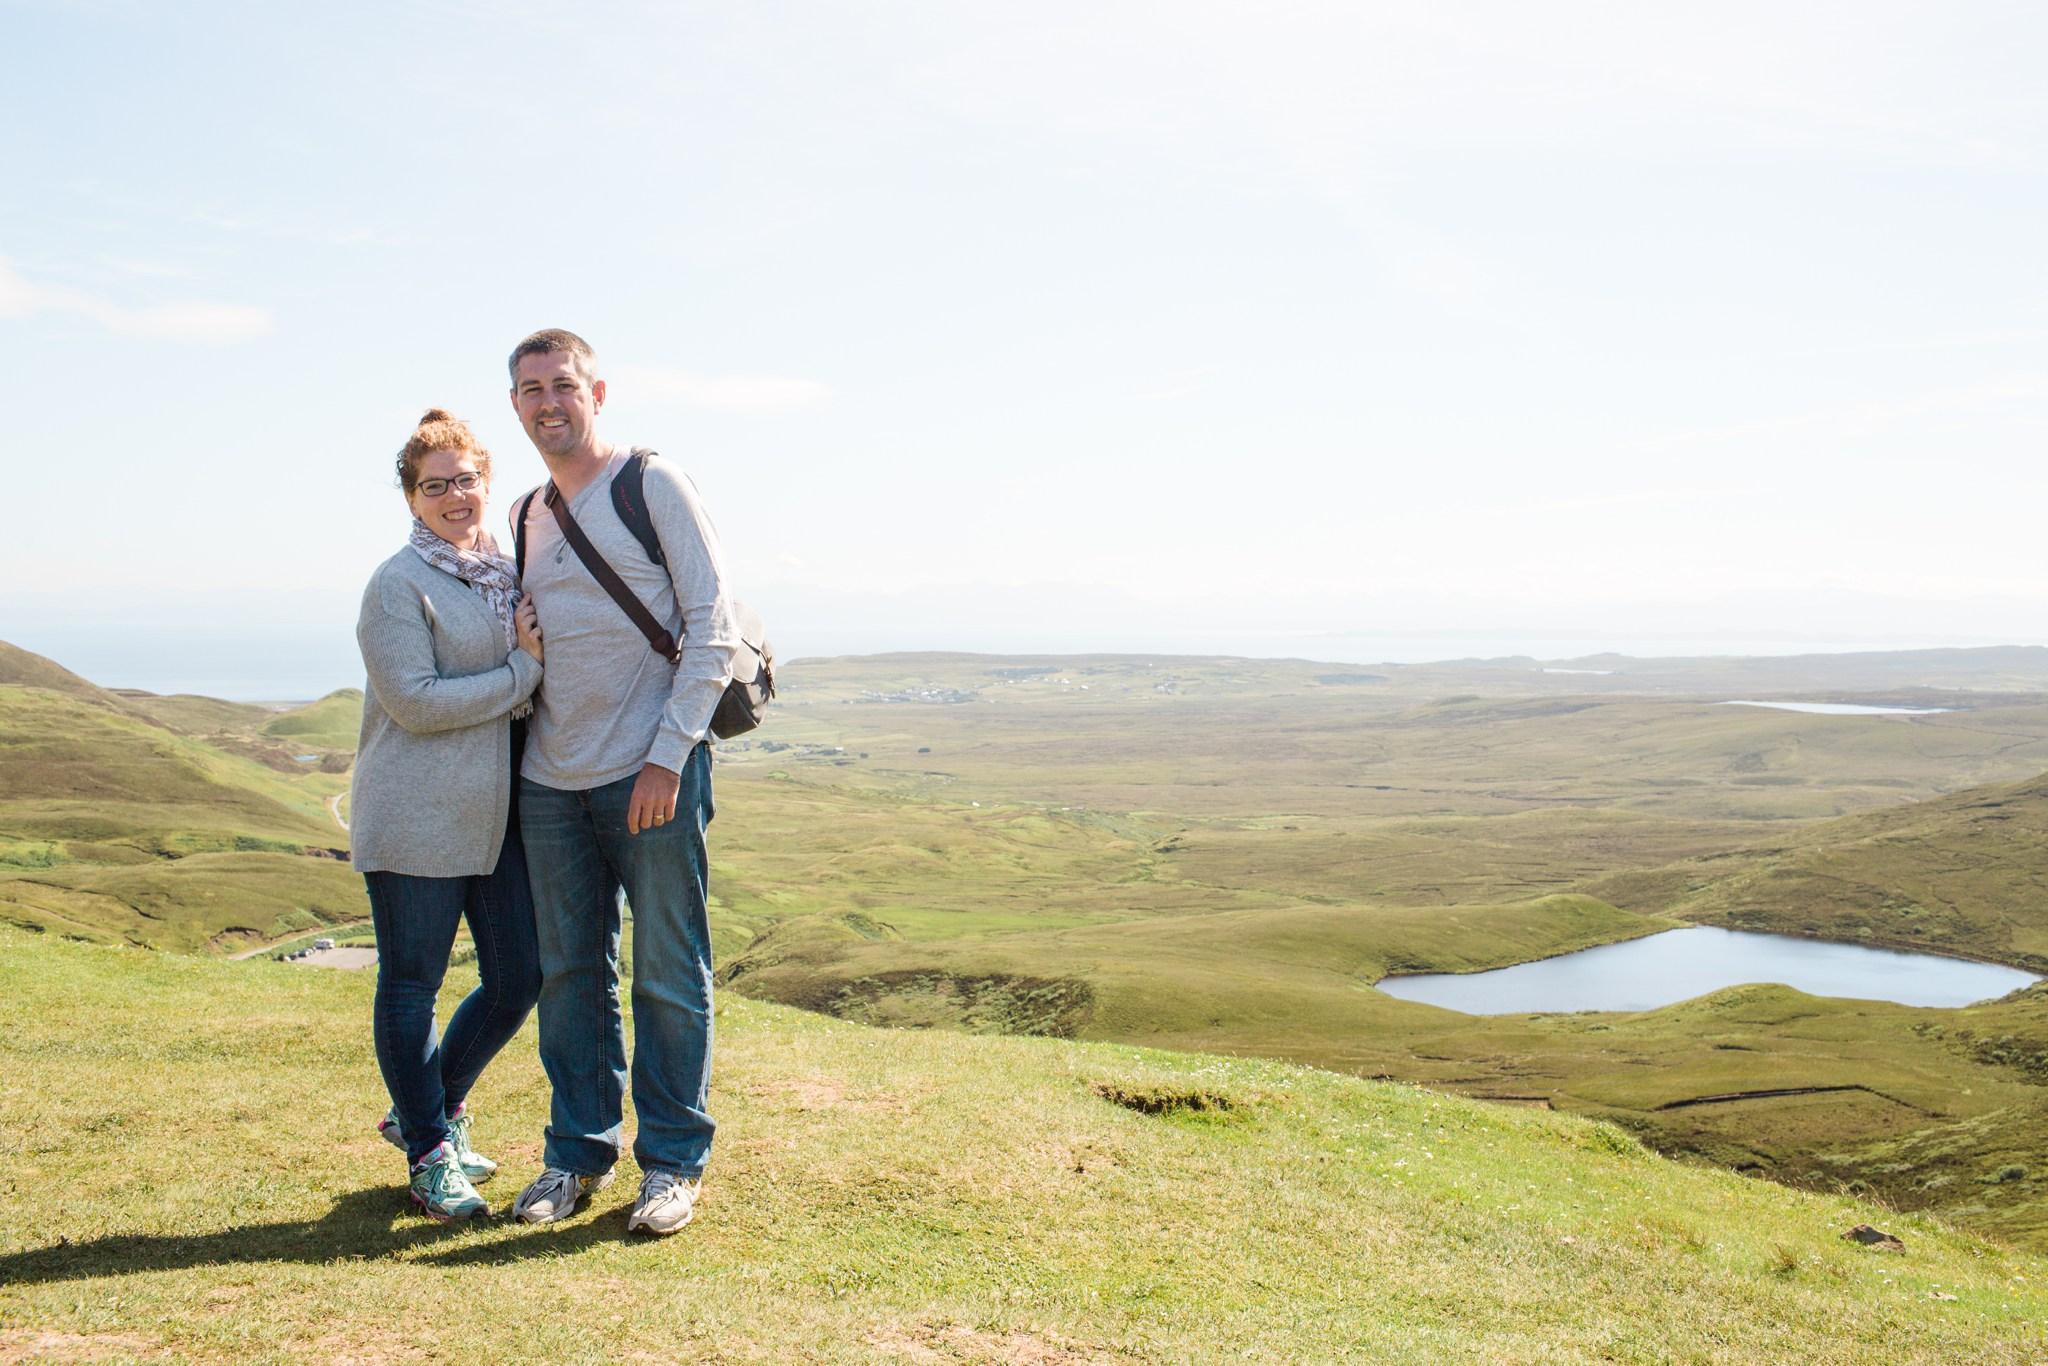 scotland_highlands_deborah_zoe_0069.JPG